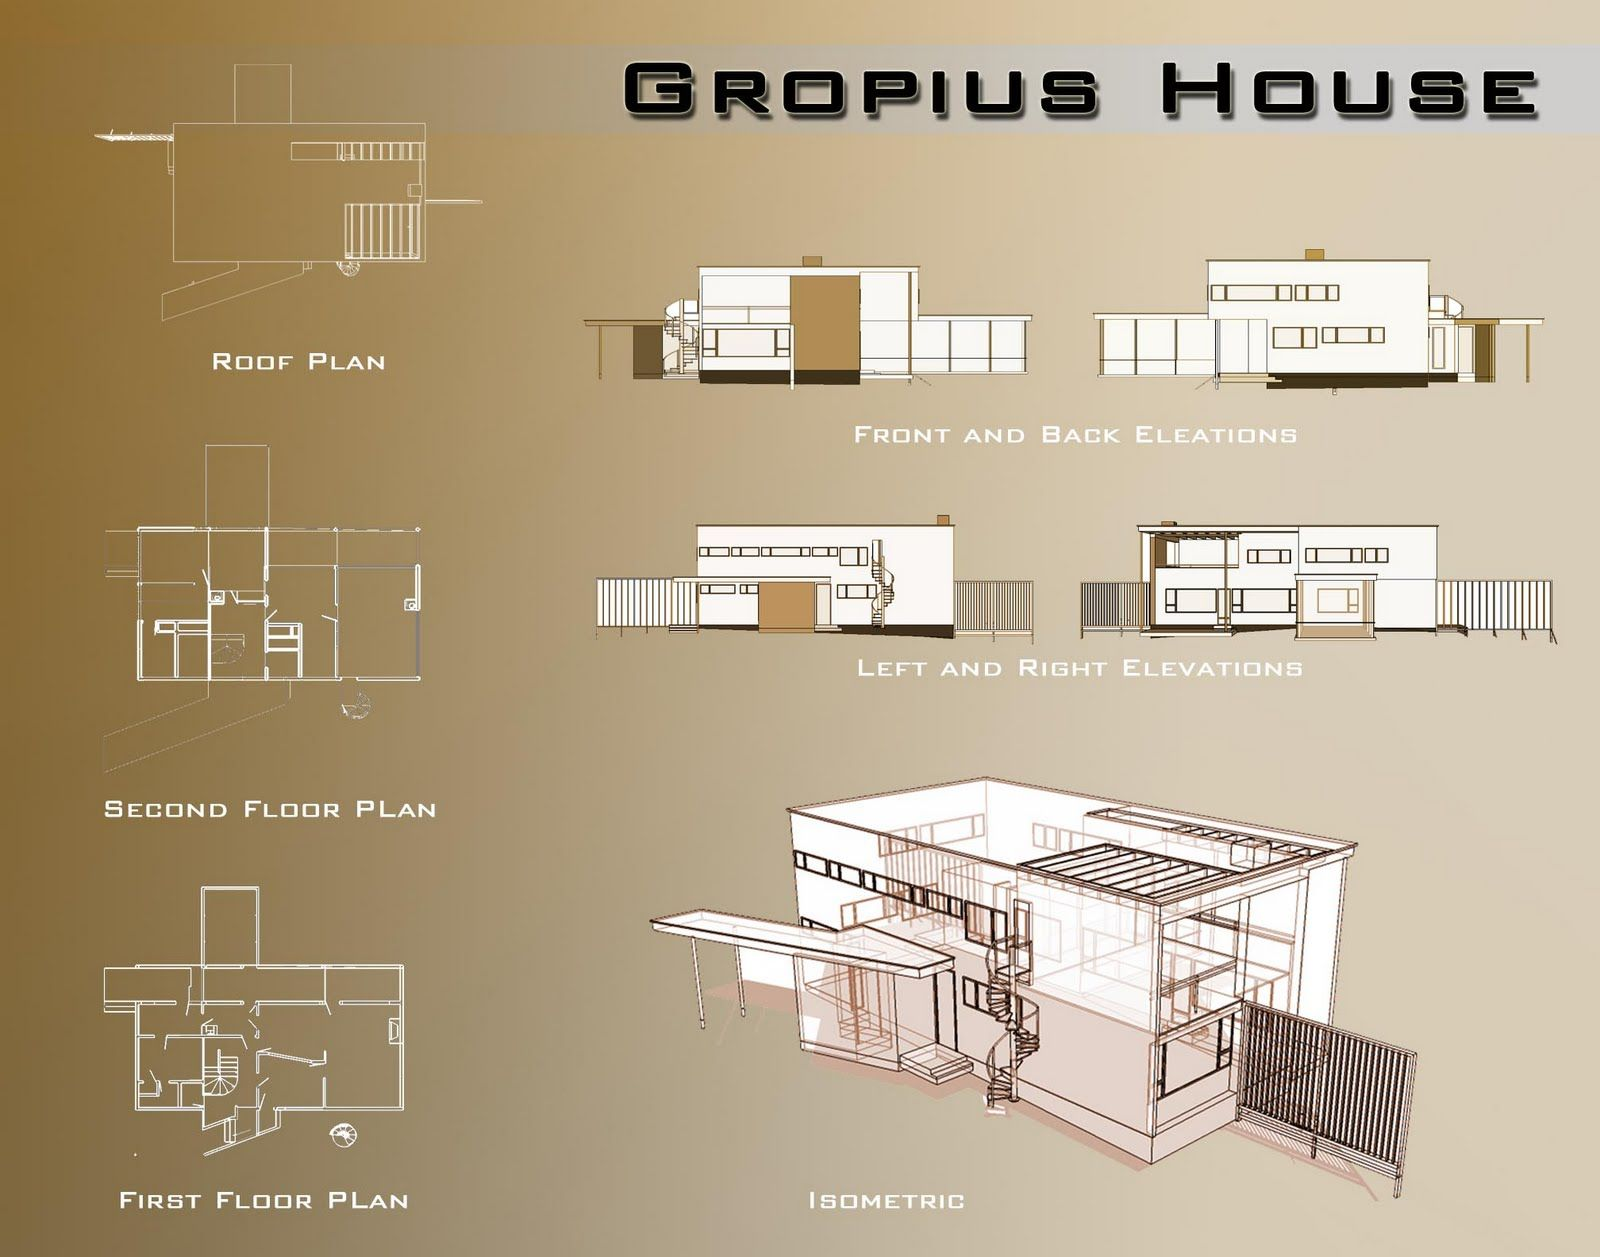 Gropius house bauhaus pinterest bauhaus arch and for Architectural flooring